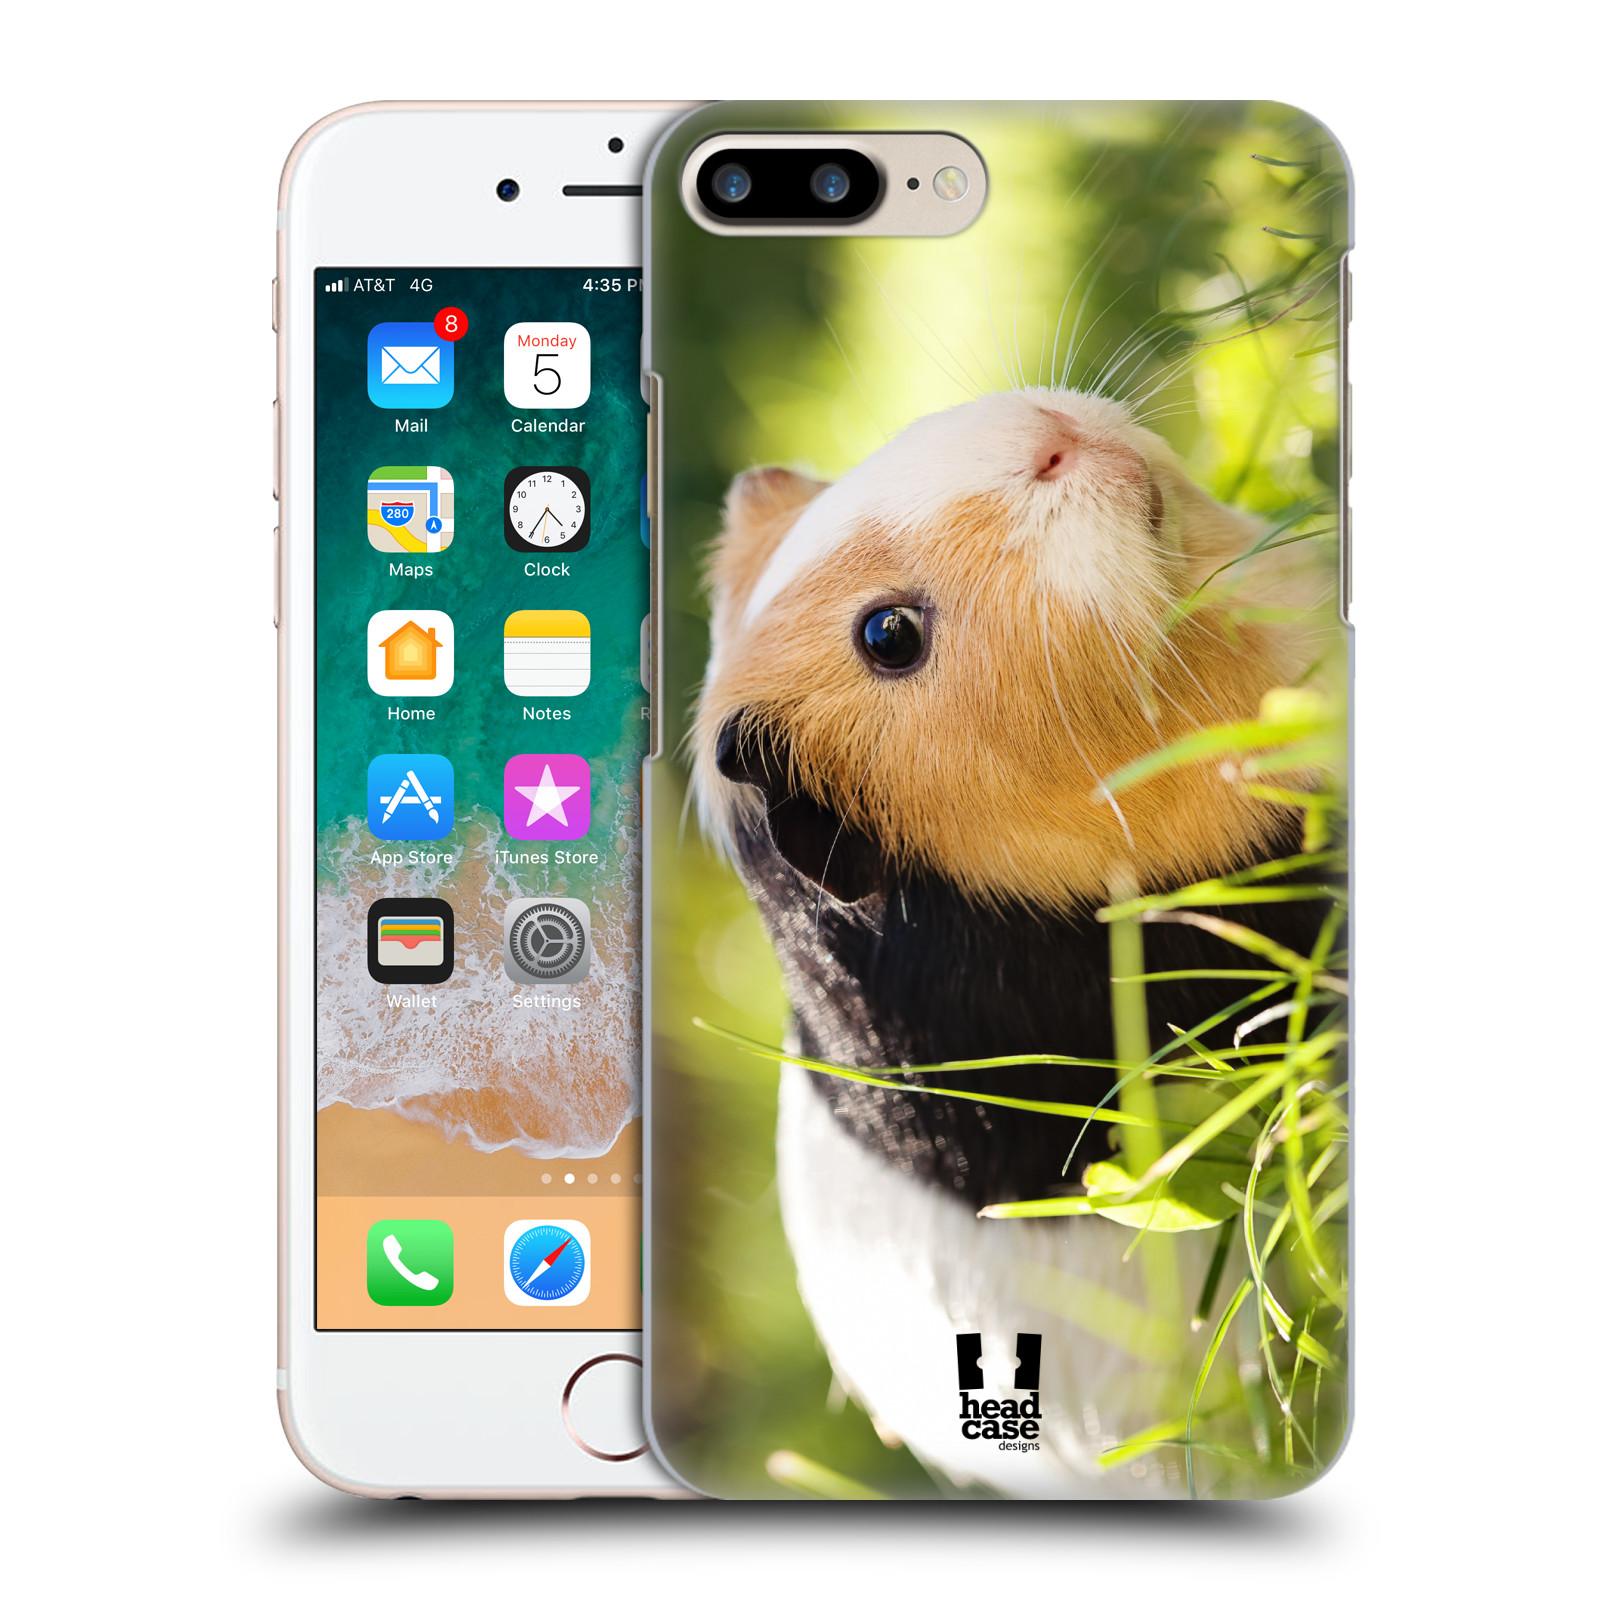 HEAD CASE plastový obal na mobil Apple Iphone 7 PLUS vzor slavná zvířata foto morče